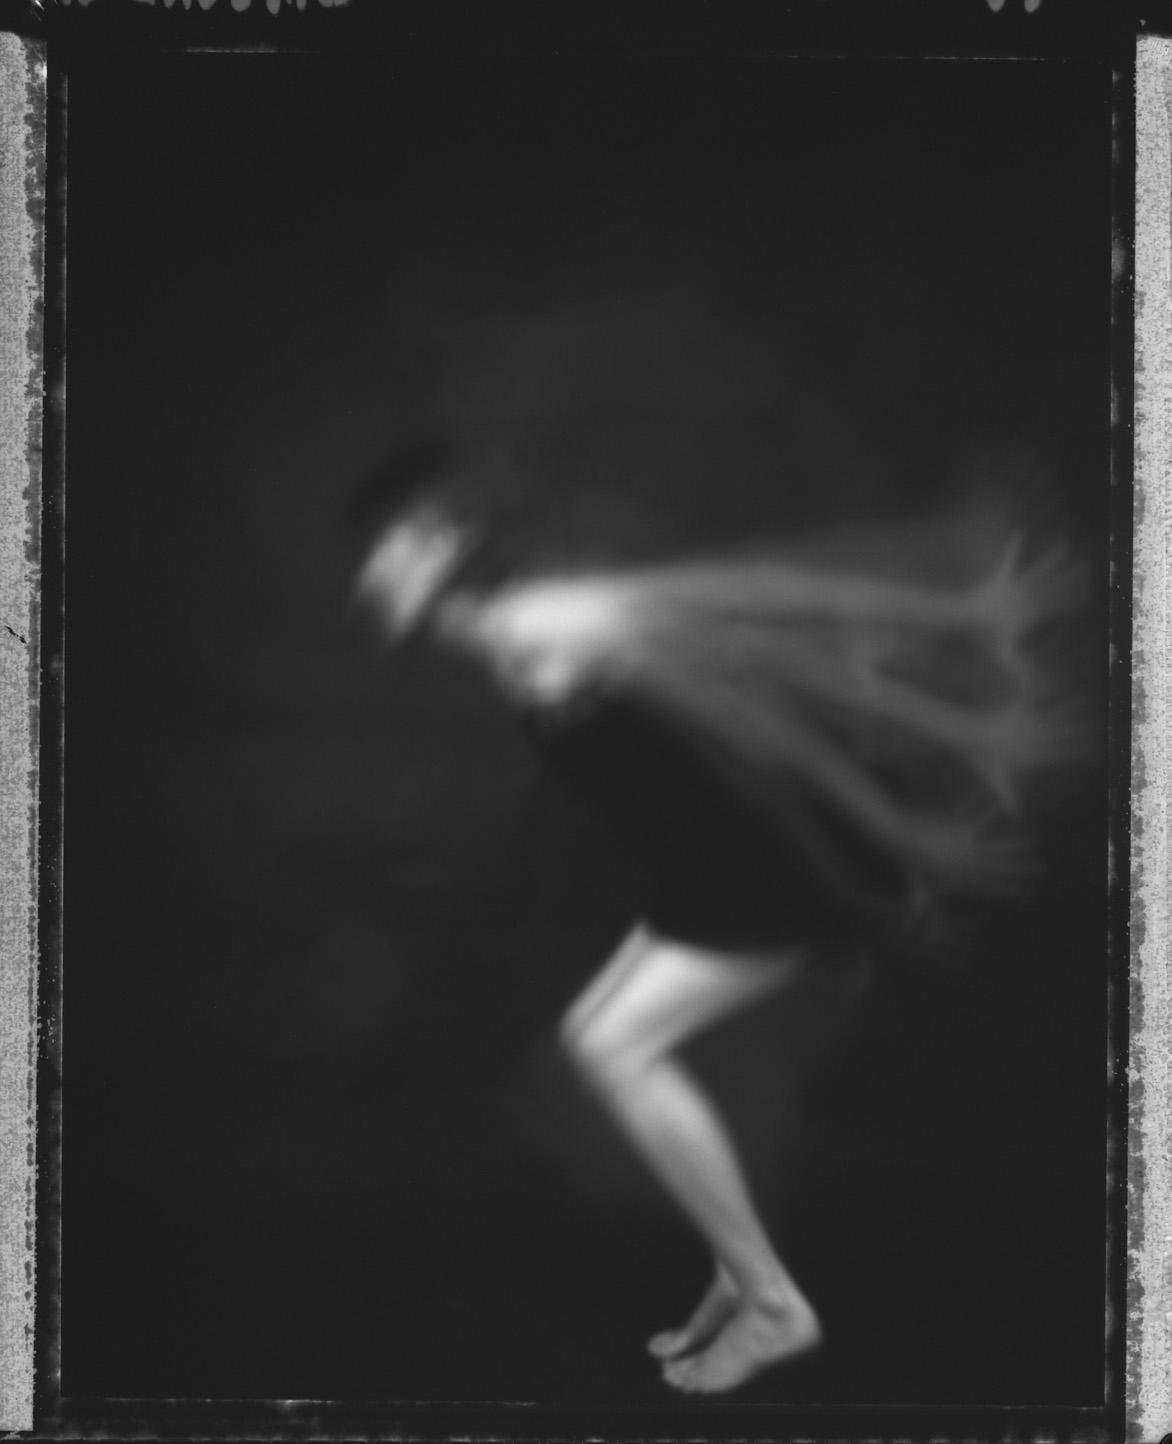 Self Portrait #8C, 2003